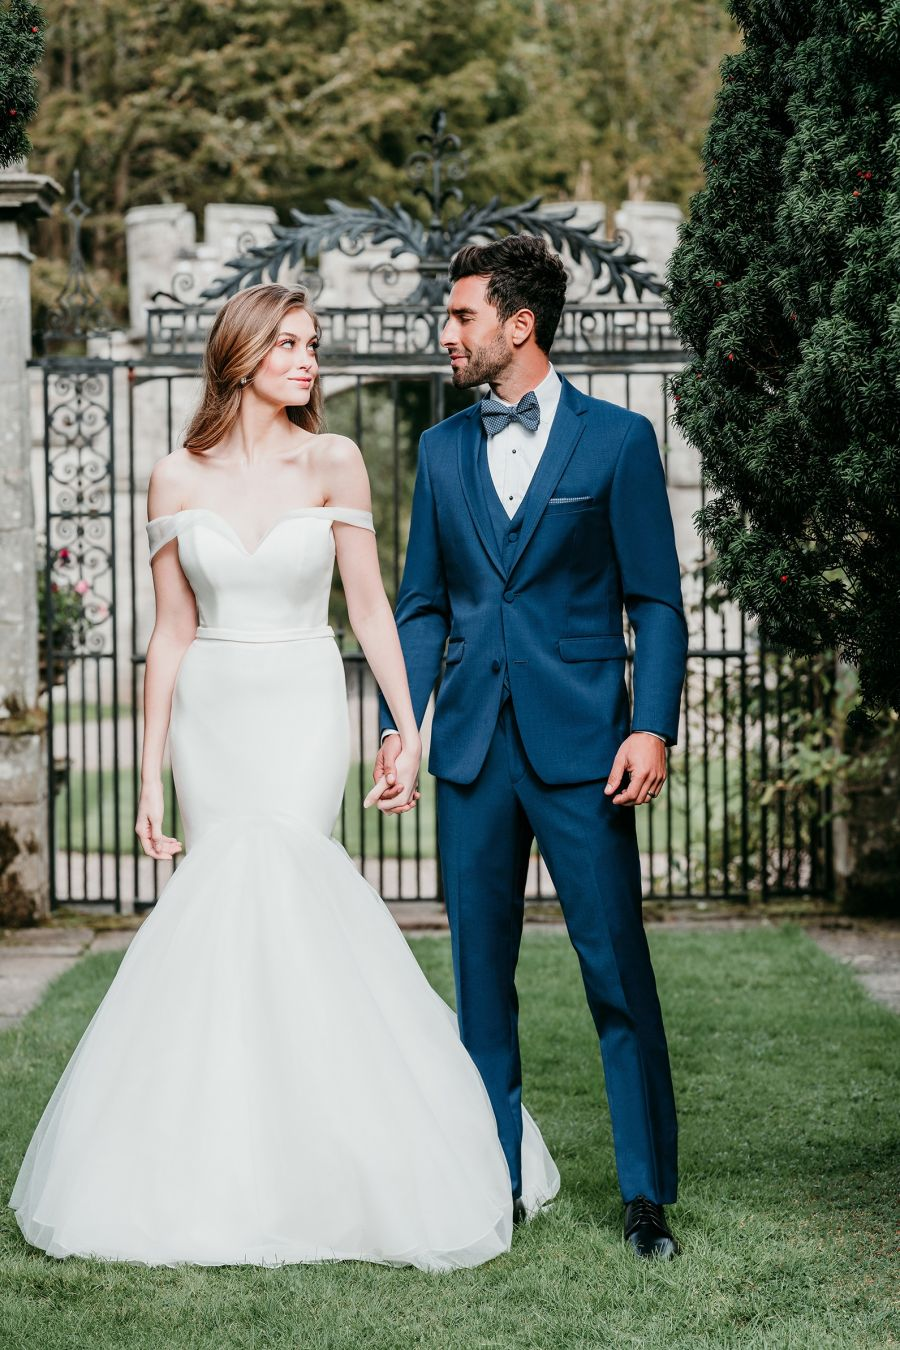 Ideias de casamento na pandemia: como adaptar seu evento